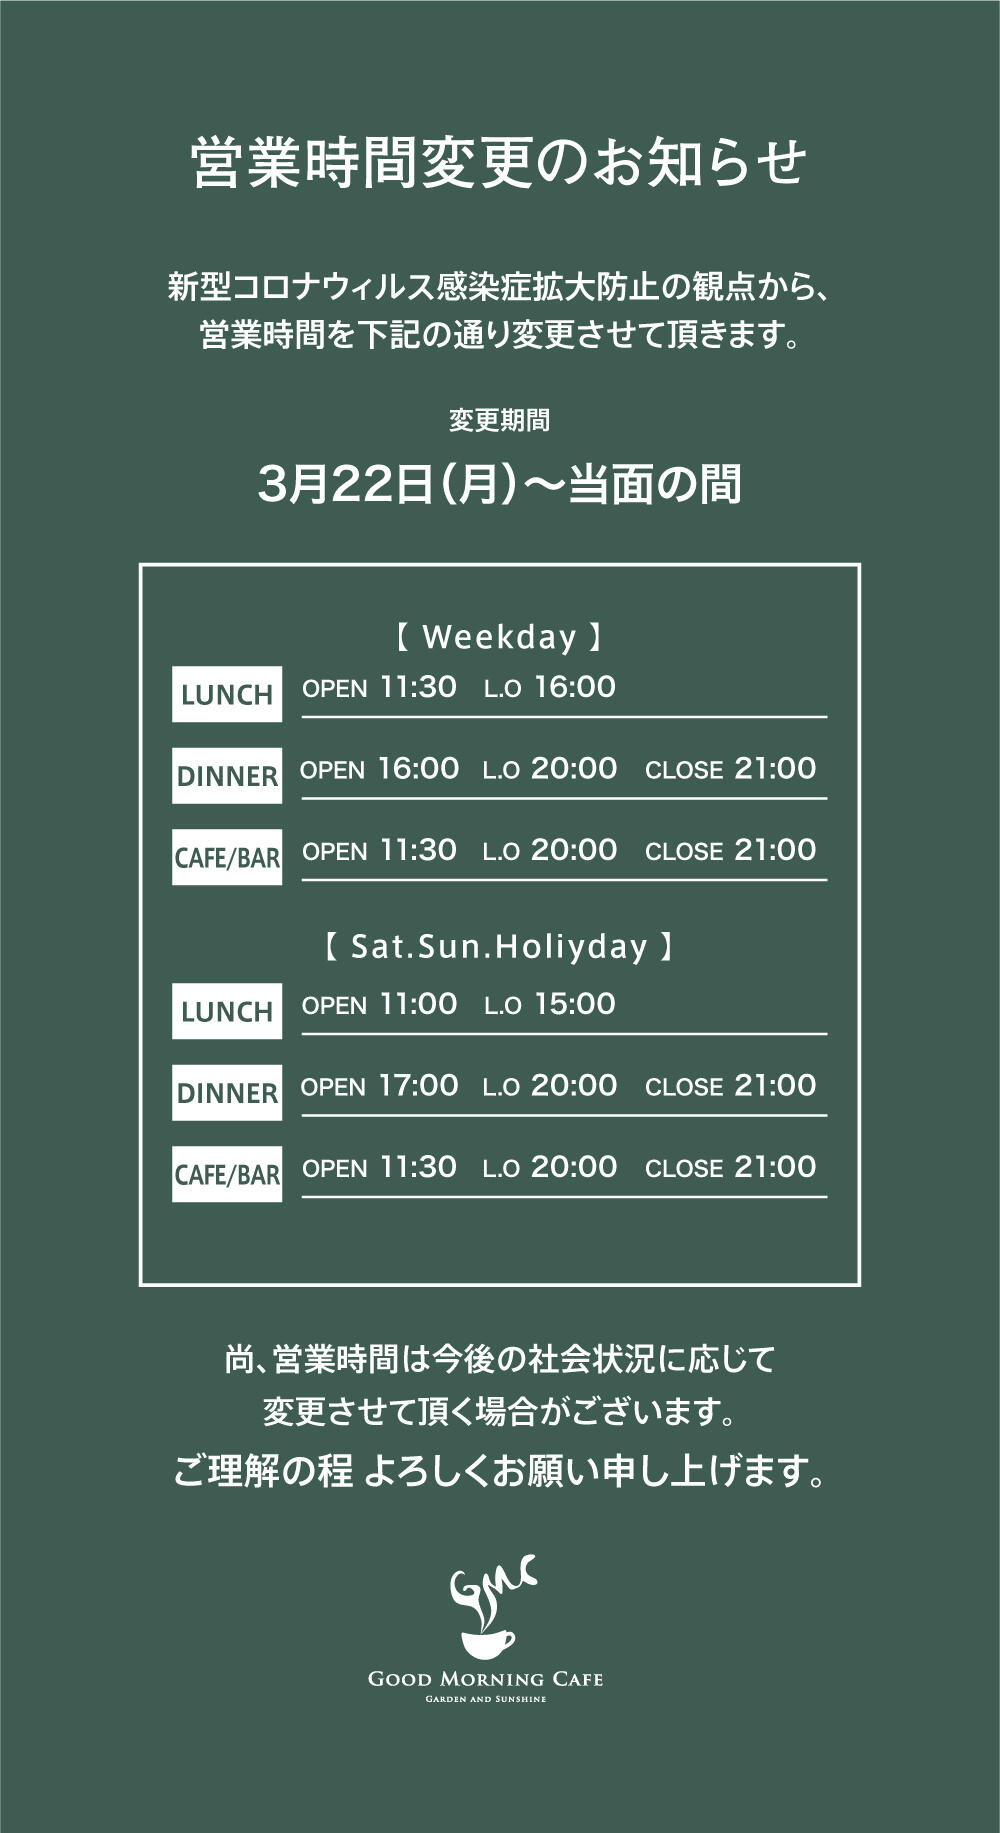 gmcsi_210322_営業時間変更.jpg